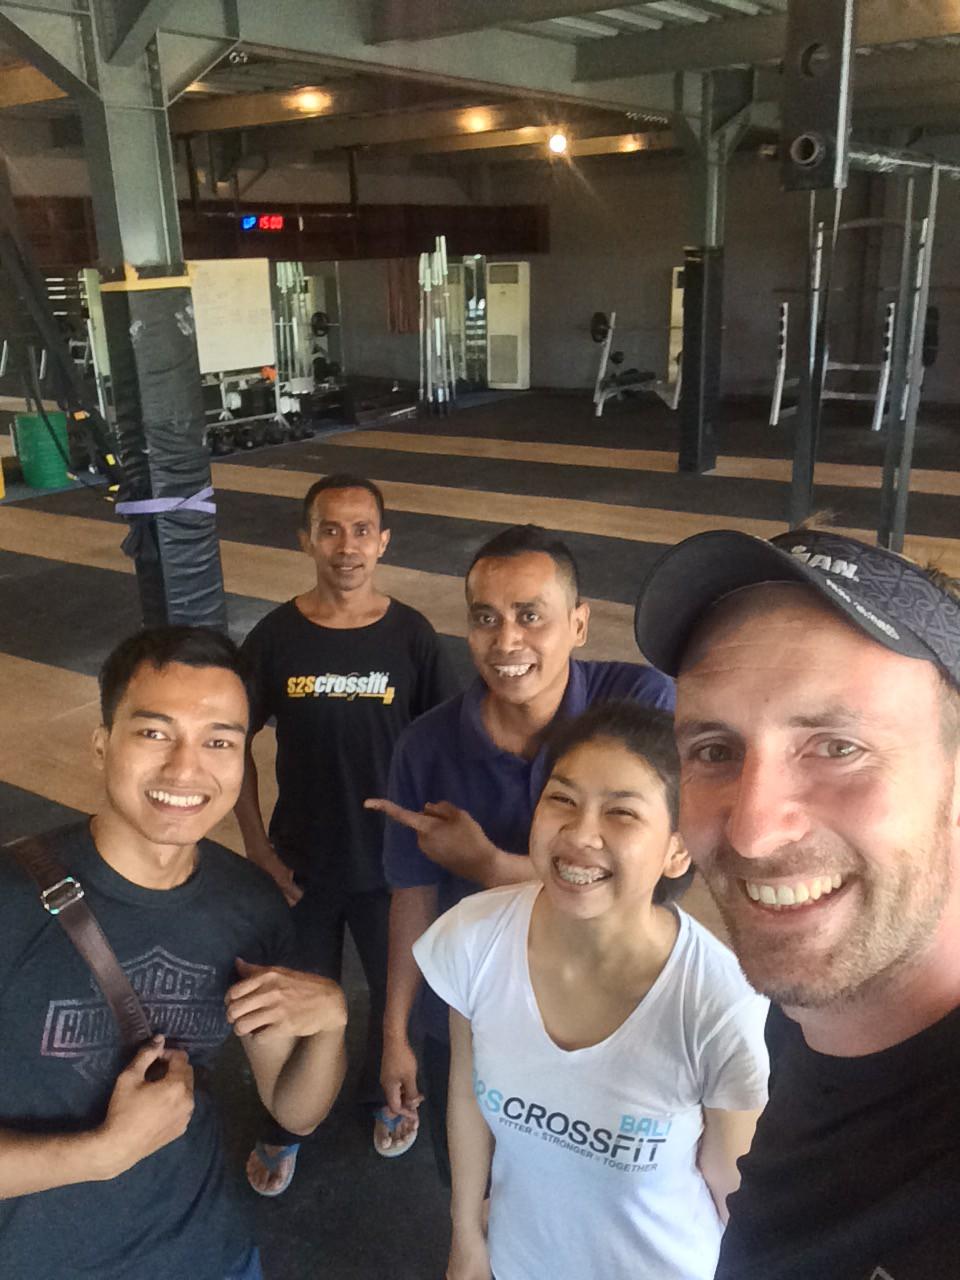 zu-Gast-im-Cross-Fit-Studio-auf-Bali